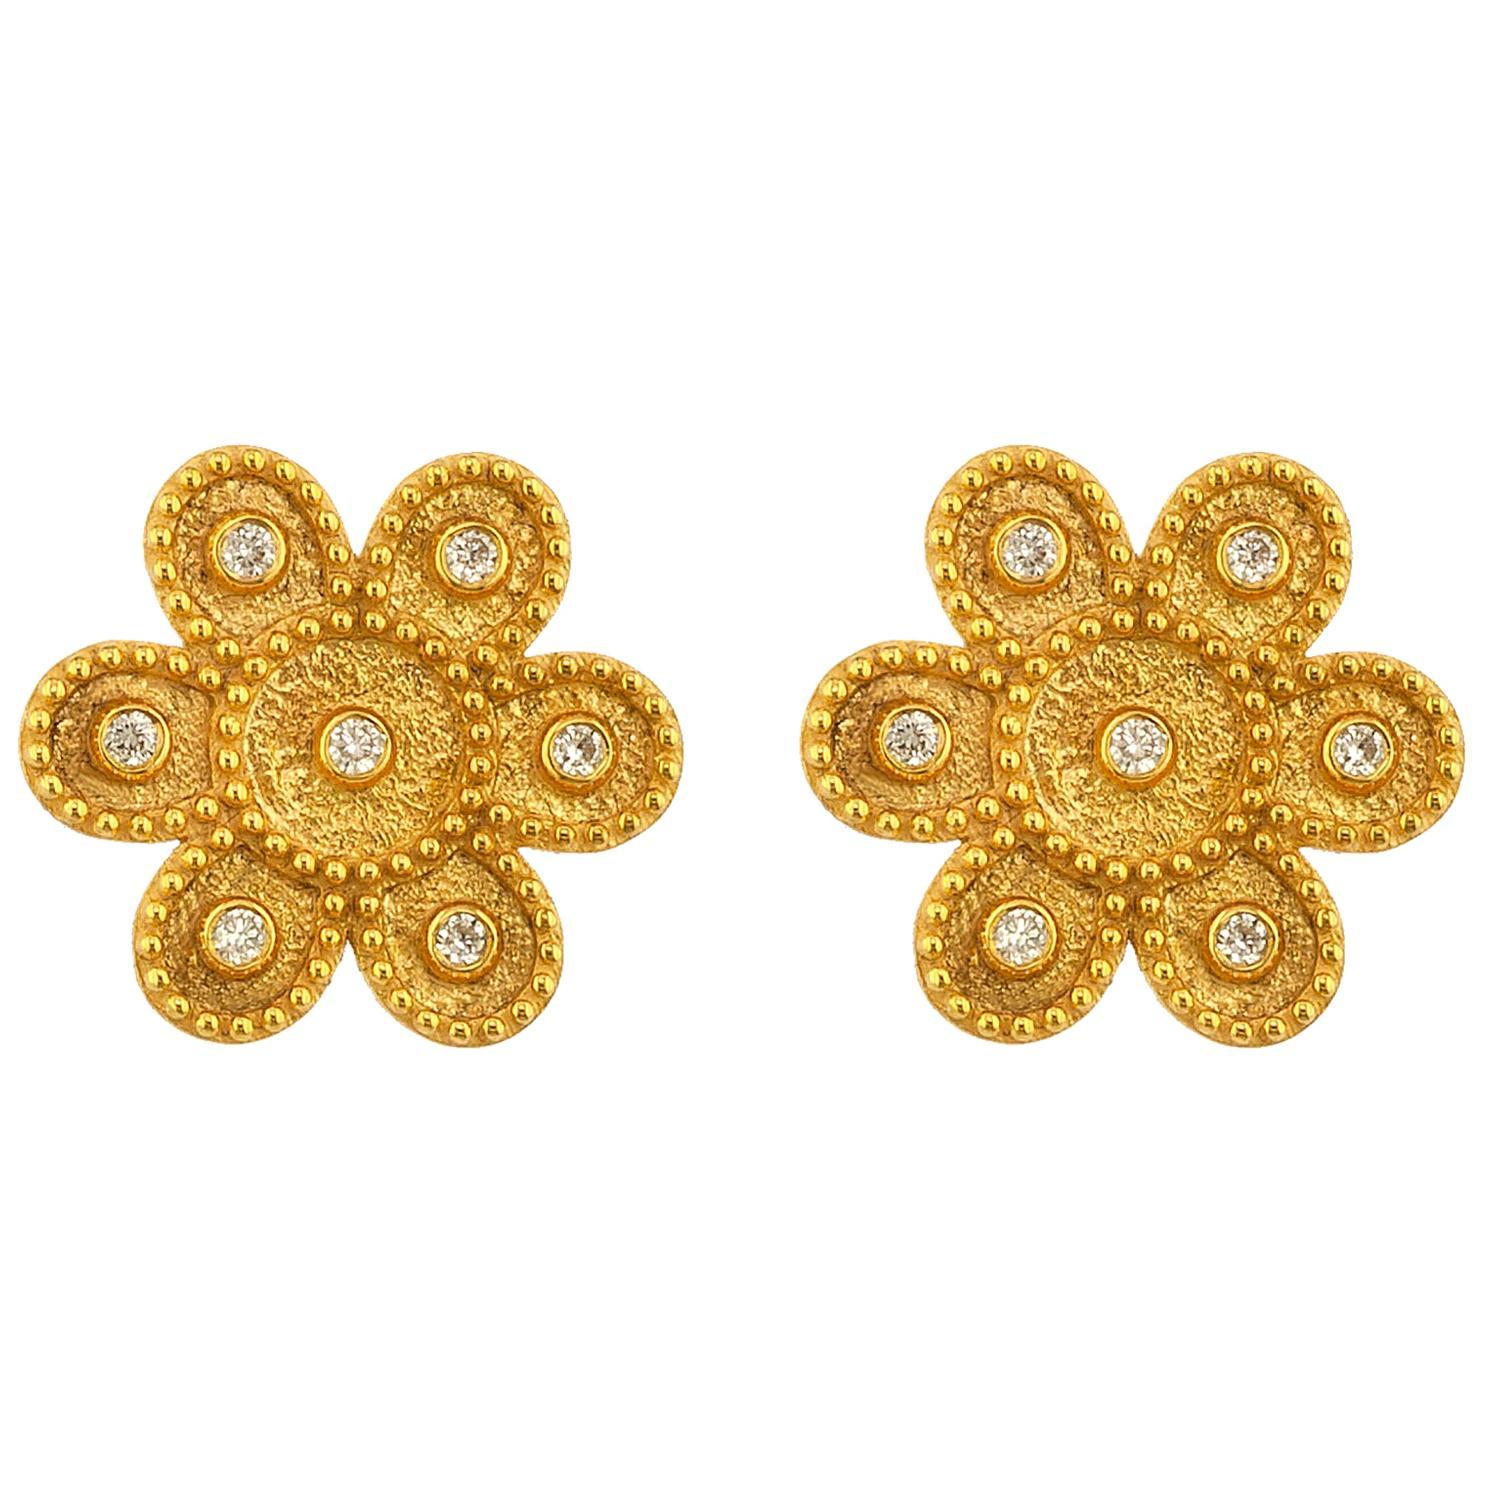 Georgios Collections 18 Karat Yellow Gold Diamond Round Flower Stud Earrings